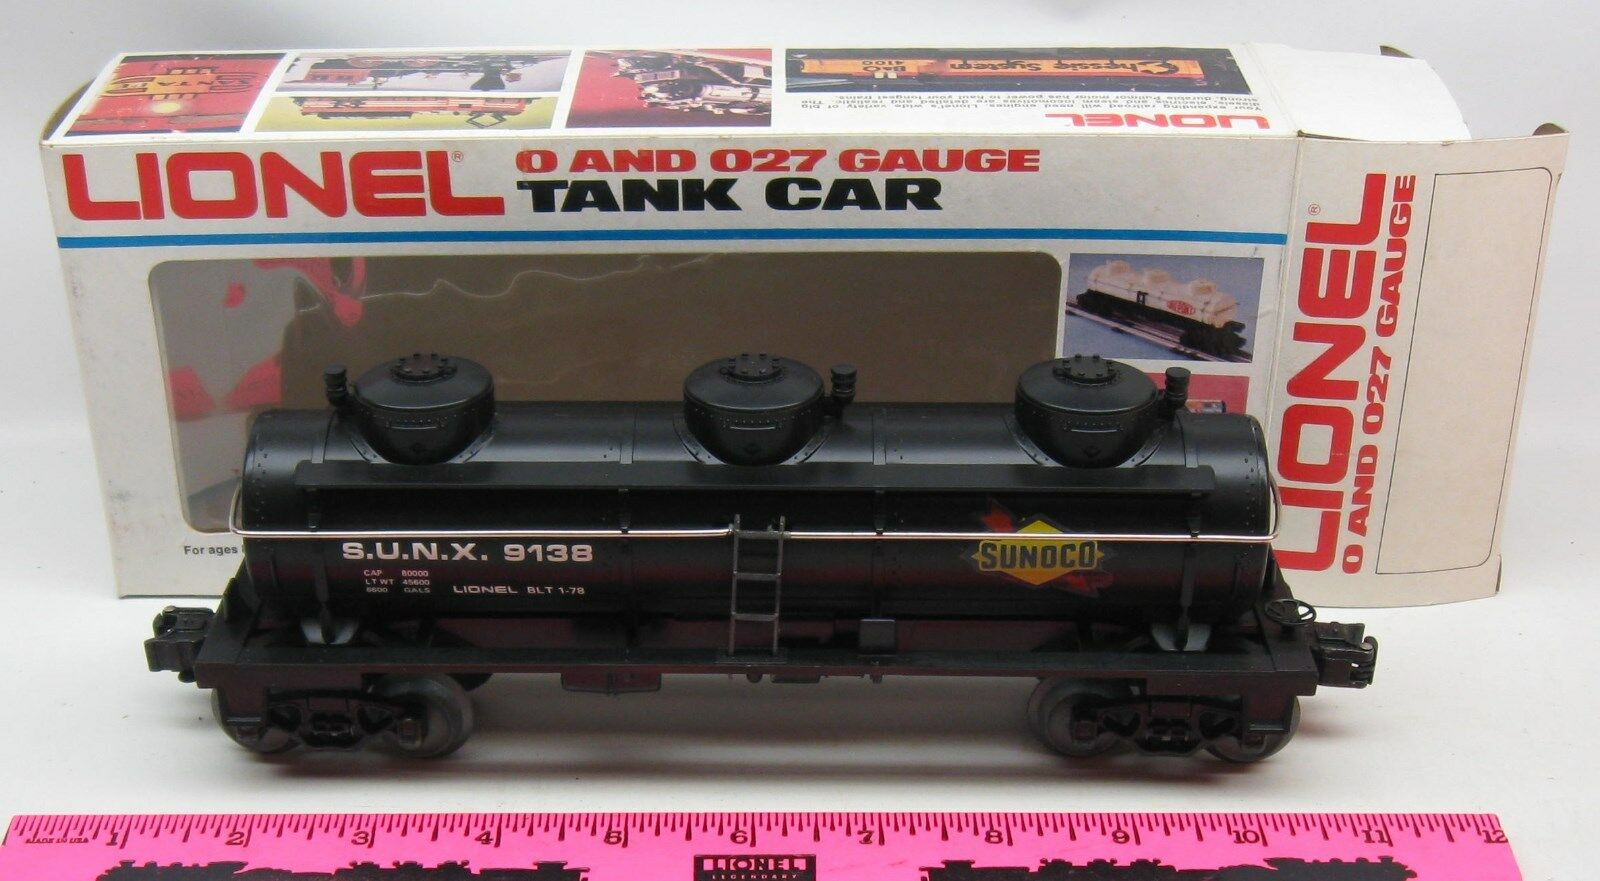 Lionel 6-9138 Sunoco 3-D tank car